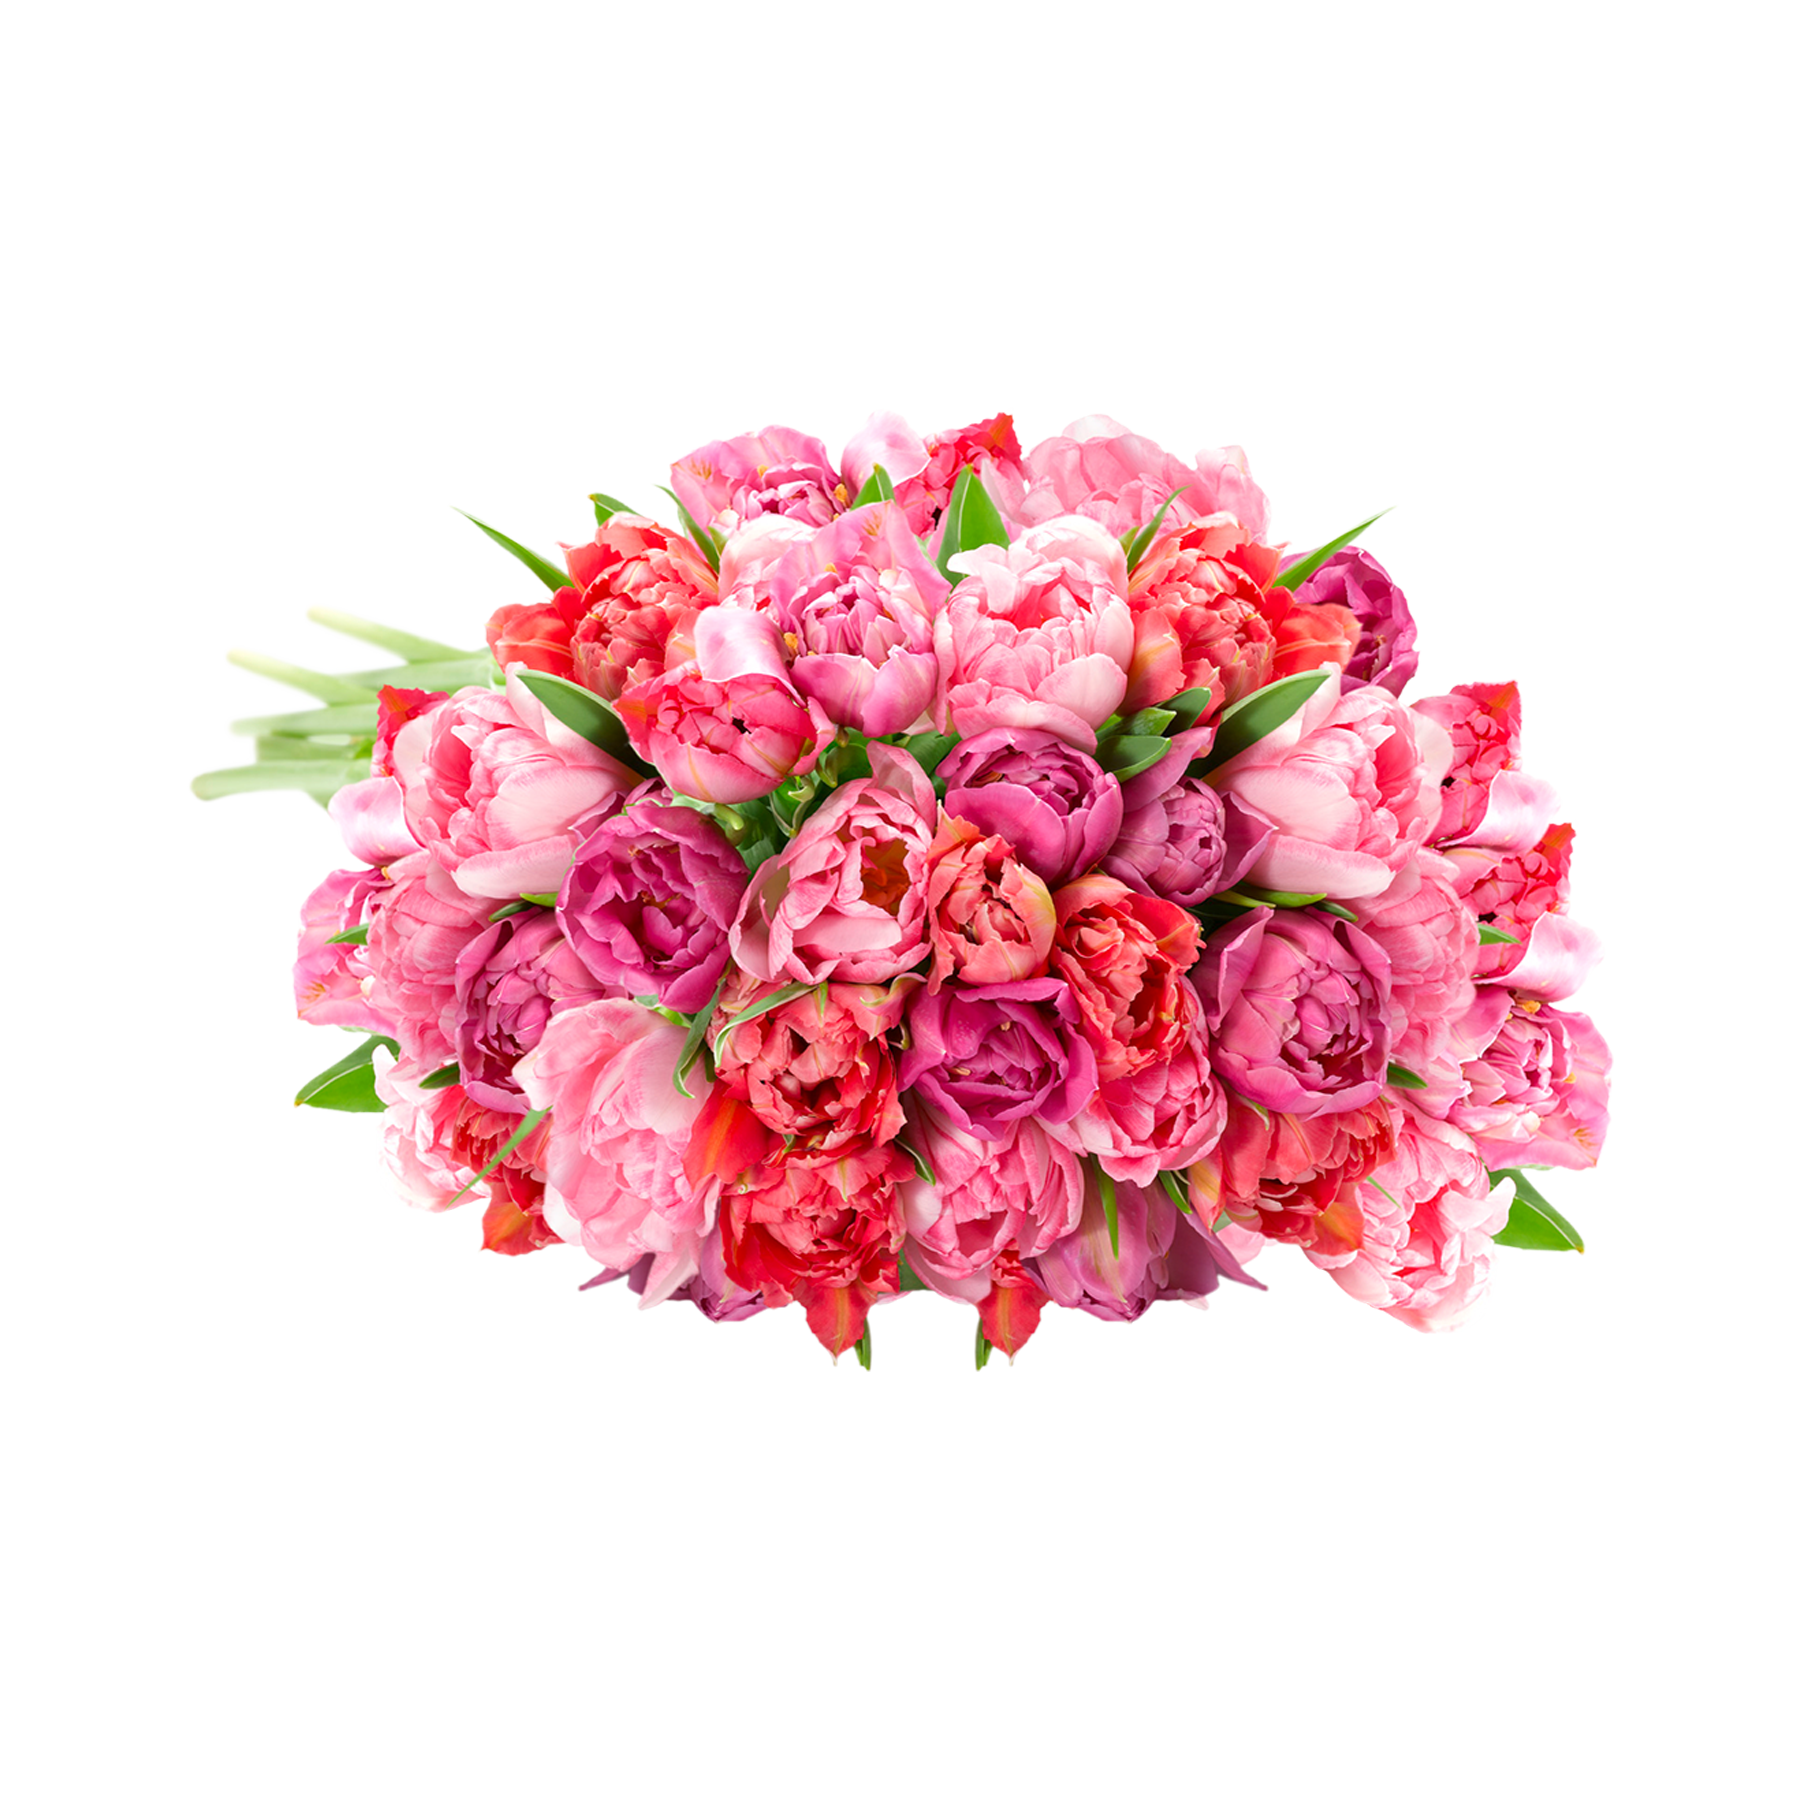 #40 Stiele rosafarbene gefüllte Tulpen#